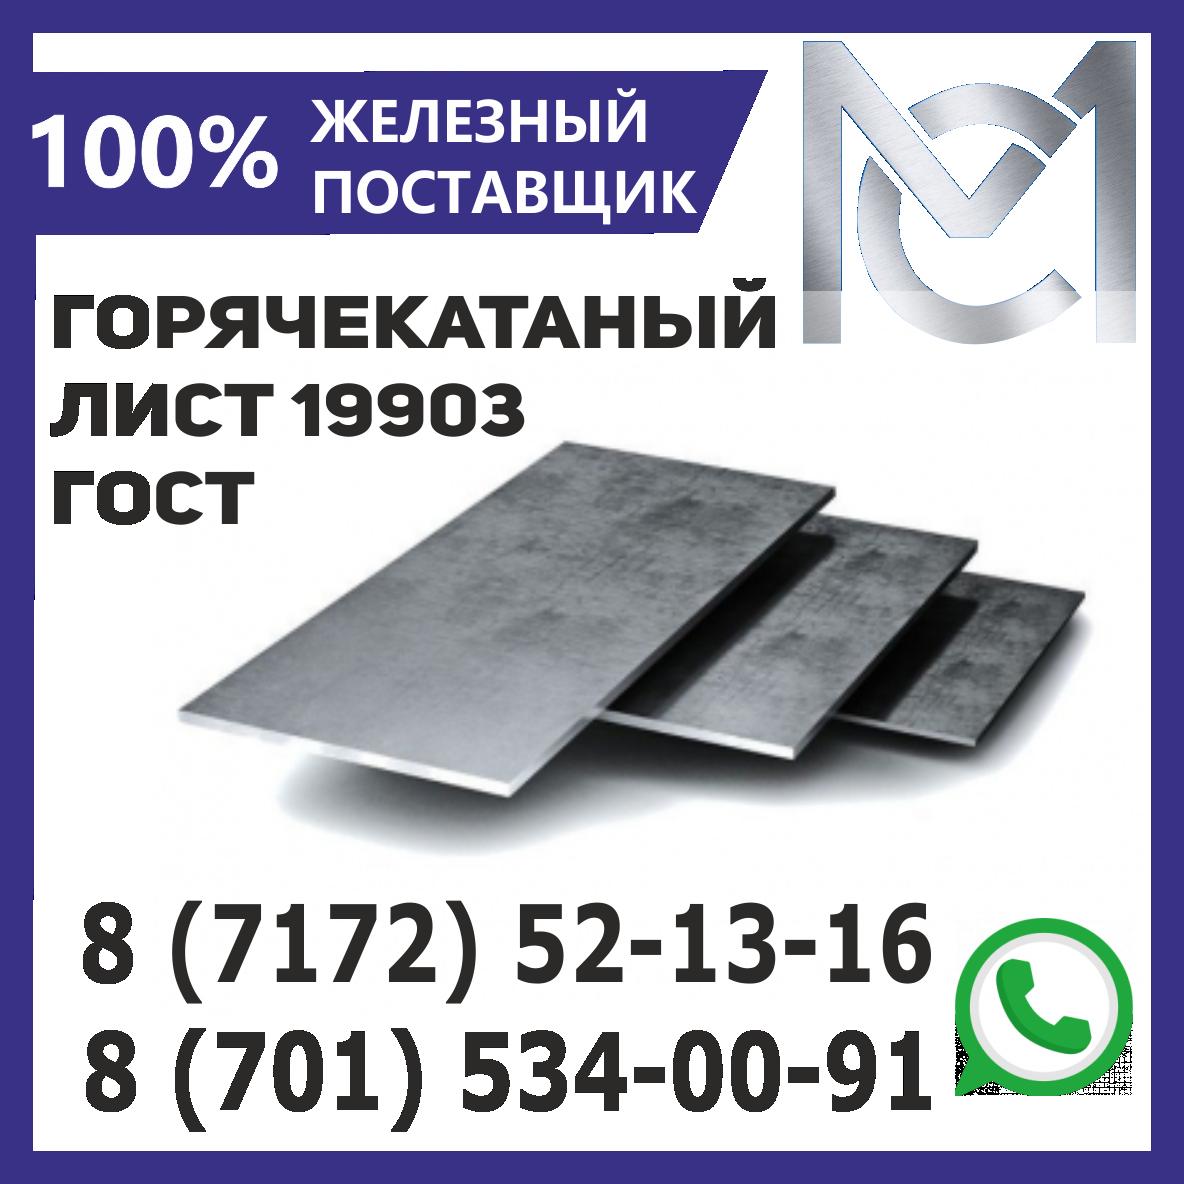 Лист 10 горячекатаный ГОСТ 19903-74, 1,5х6,0 м.